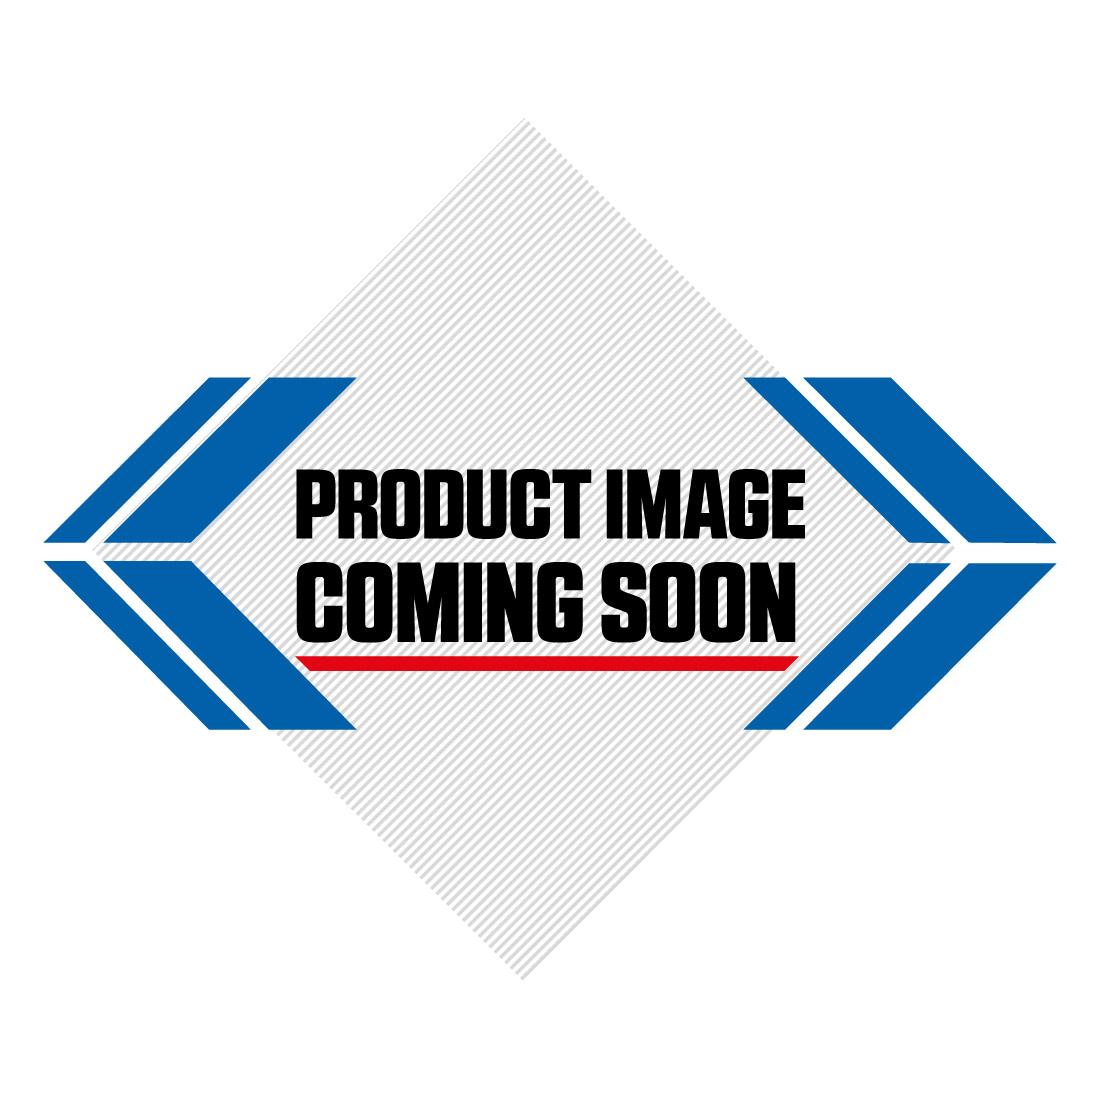 Suzuki Restyled Plastic Kit  RM 85 (00-20) RM Yellow 01-on Image-4>